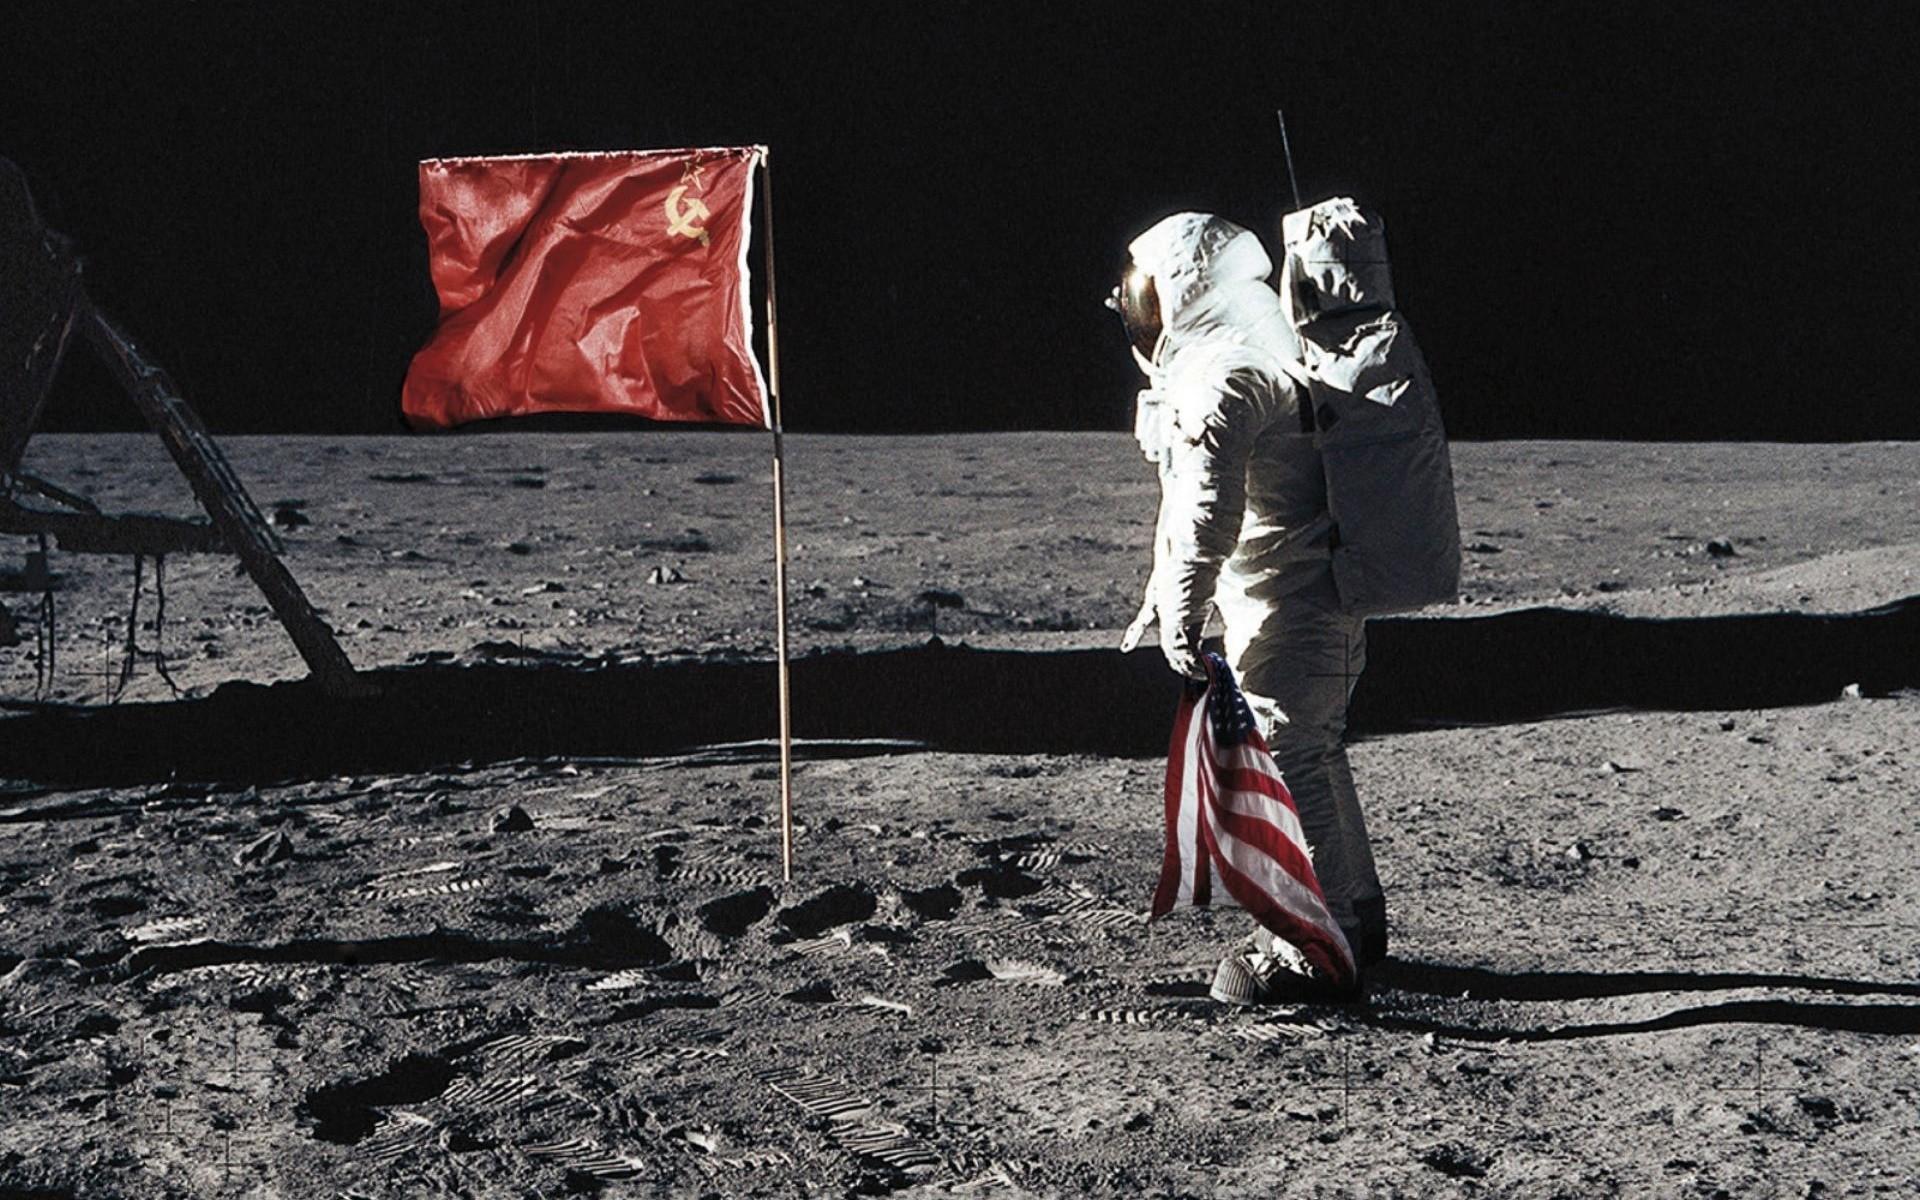 El hombre en la luna parodia - 1920x1200